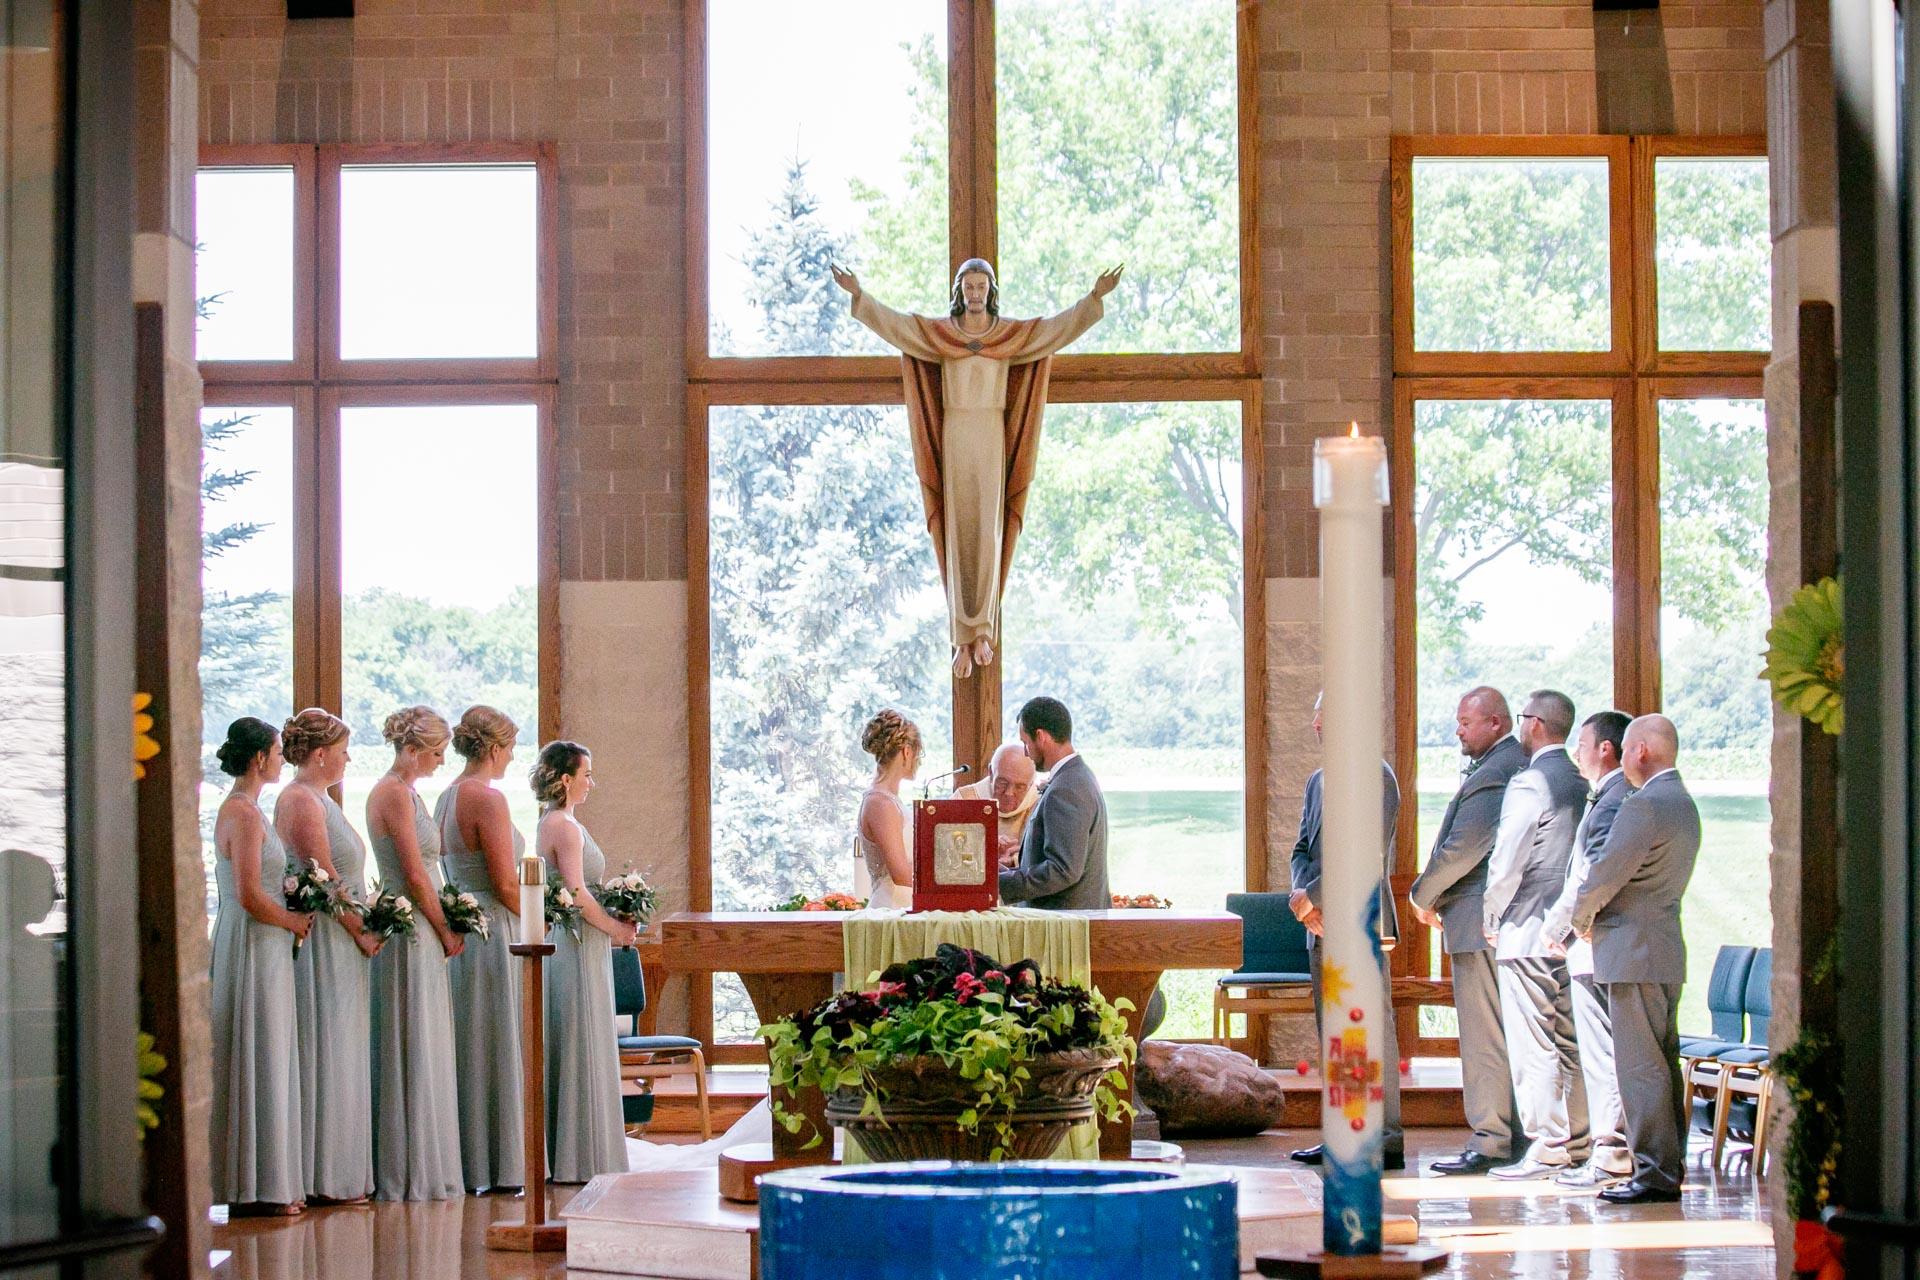 st-joan-of-arc-catholic-church-delafield-adam-shea-photography-green-bay-appleton-neenah-photographer-18.jpg